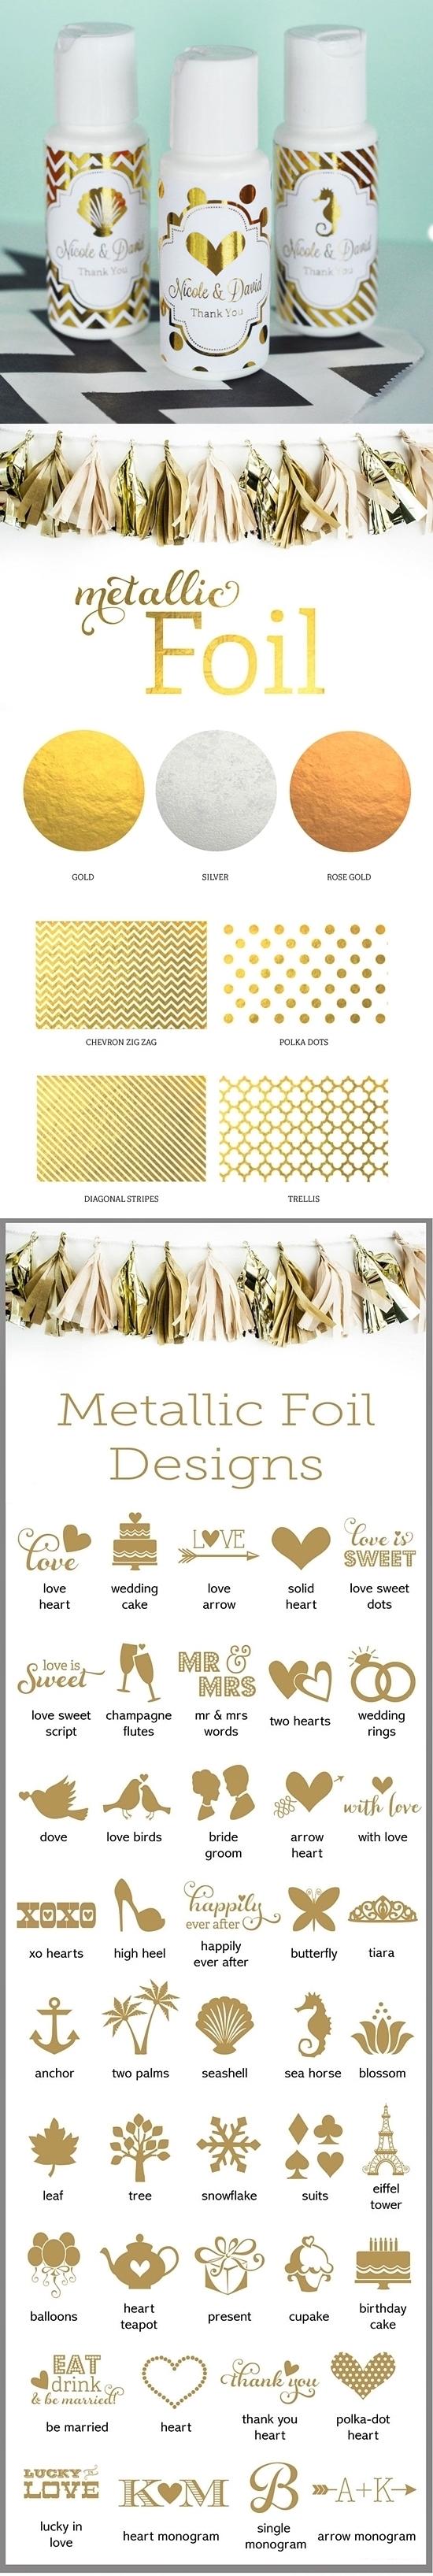 Event Blossom Personalized Metallic Foil Sunscreen Bottles (Wedding)